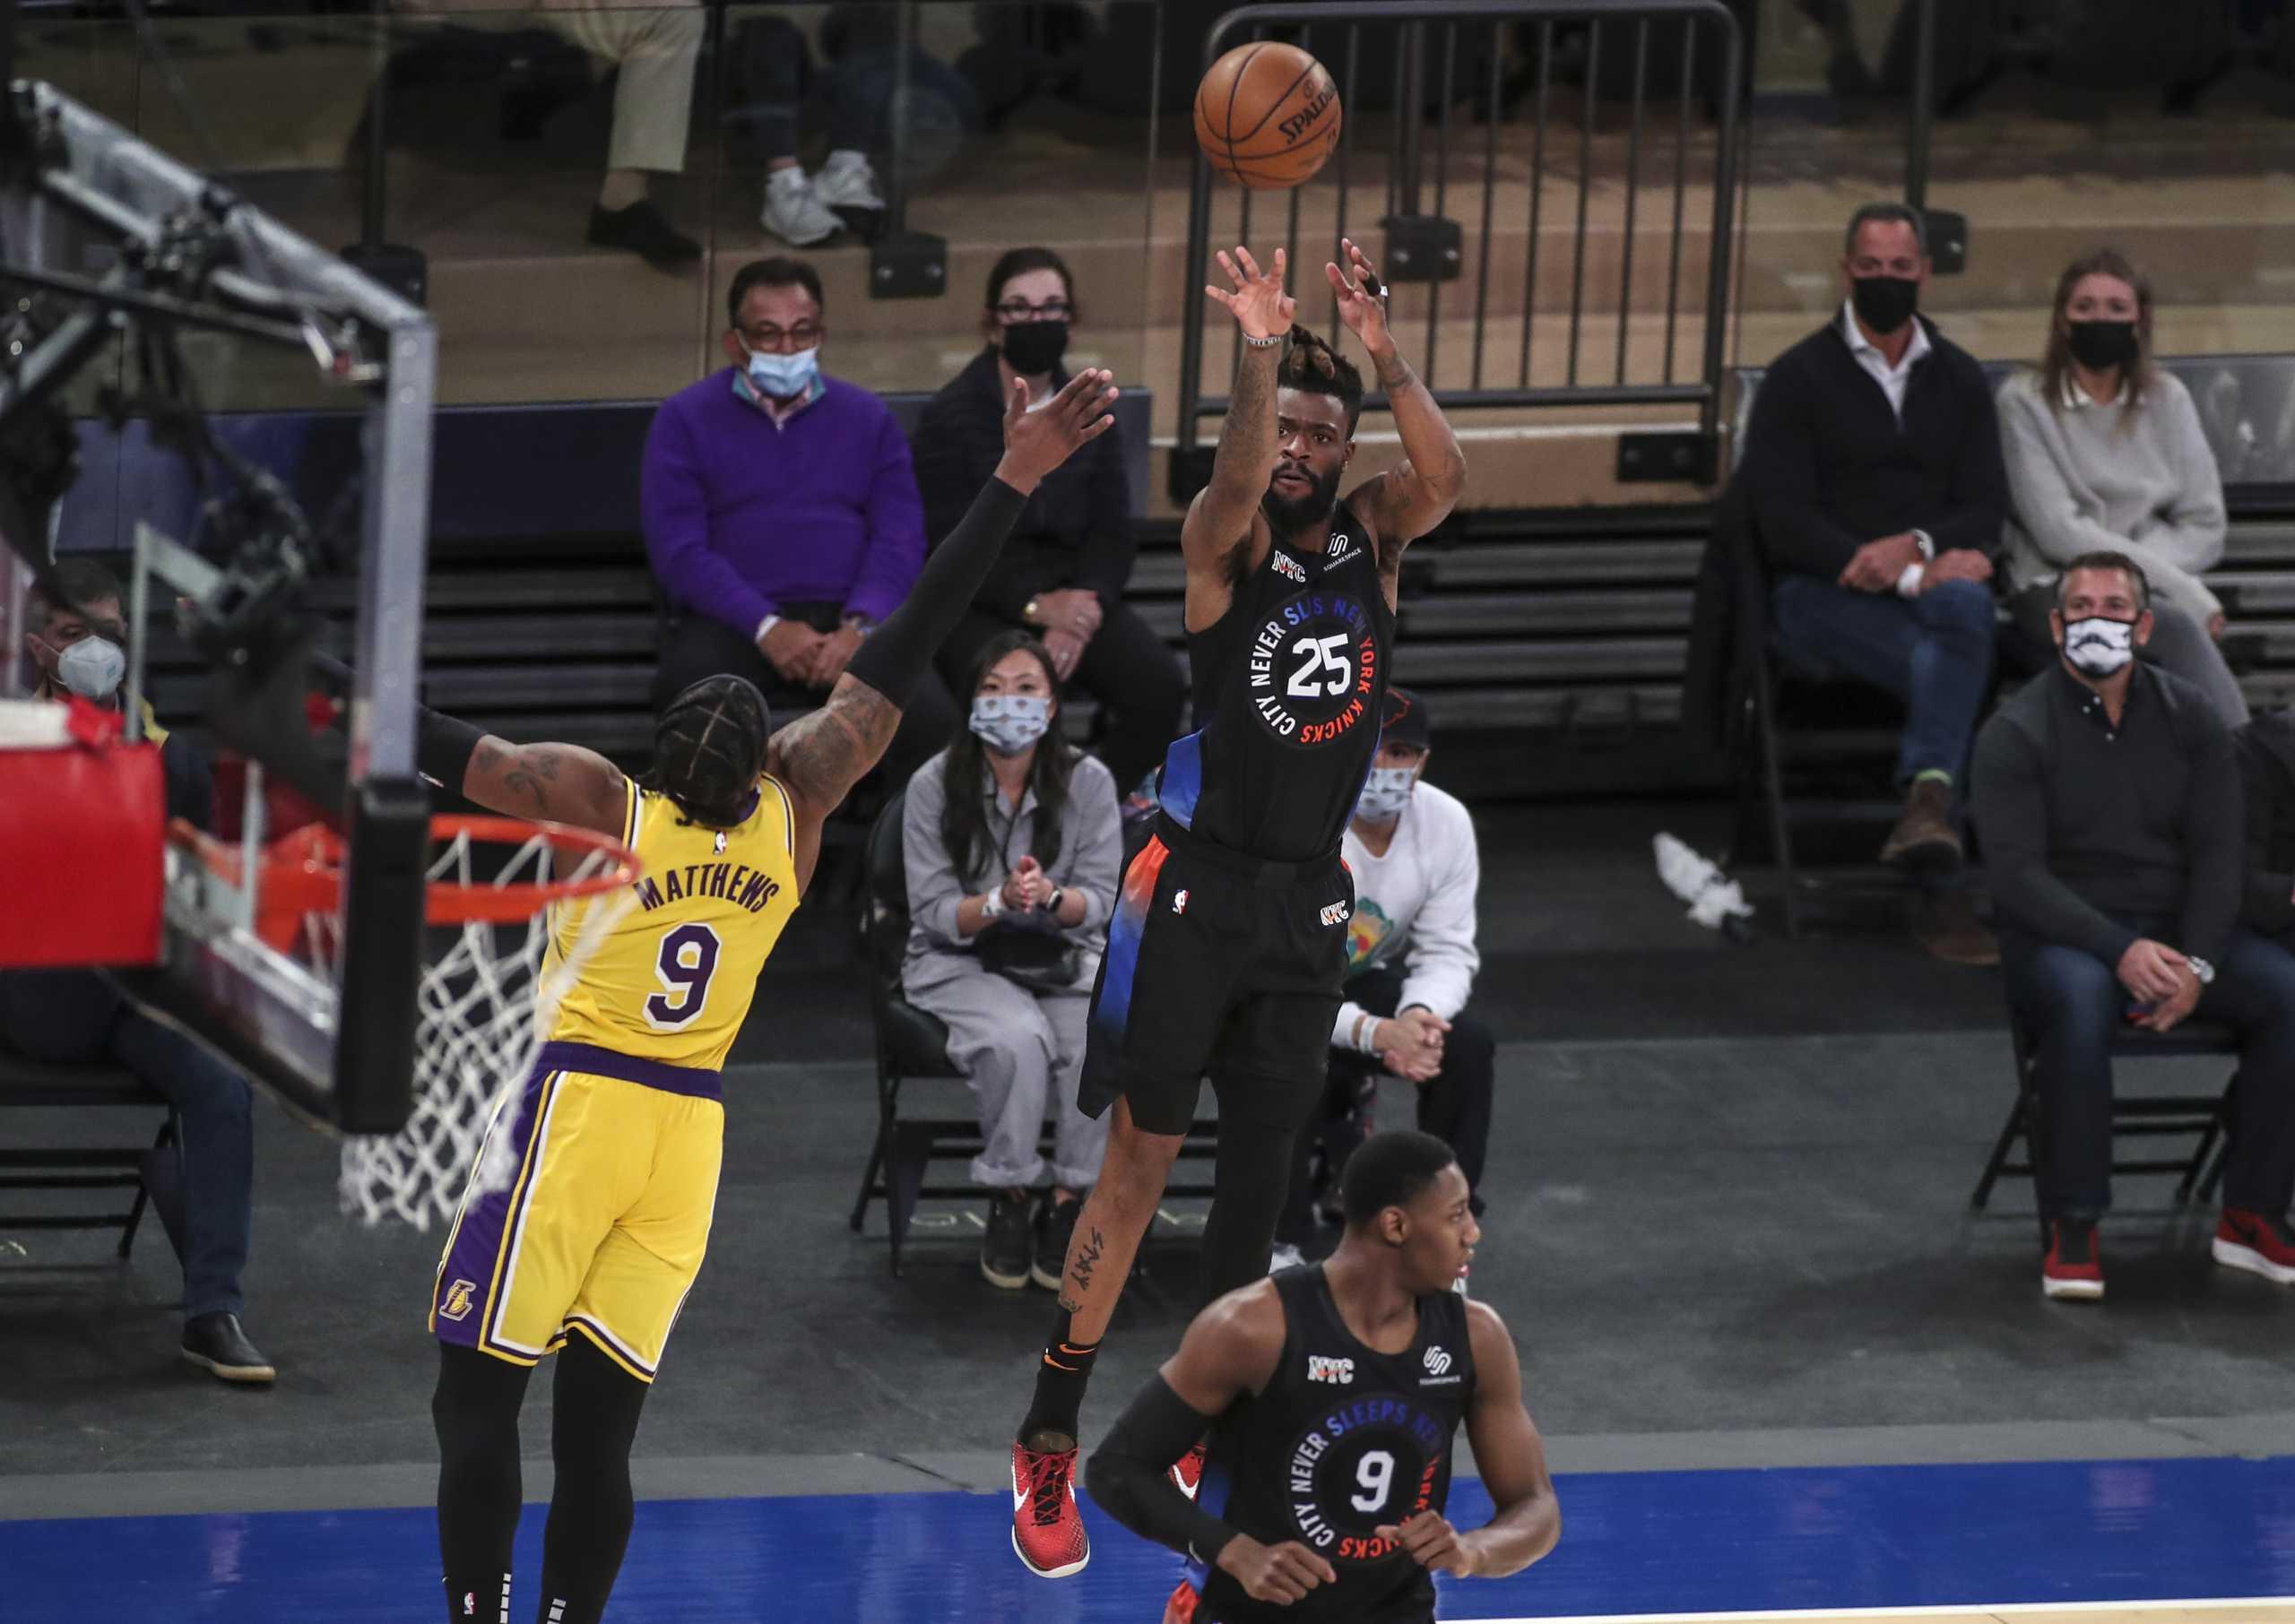 NBA: Ασταμάτητοι οι Σίξερς – Χωρίς Λεμπρόν και Ντέιβις παραπαίουν οι Λέικερς (video)